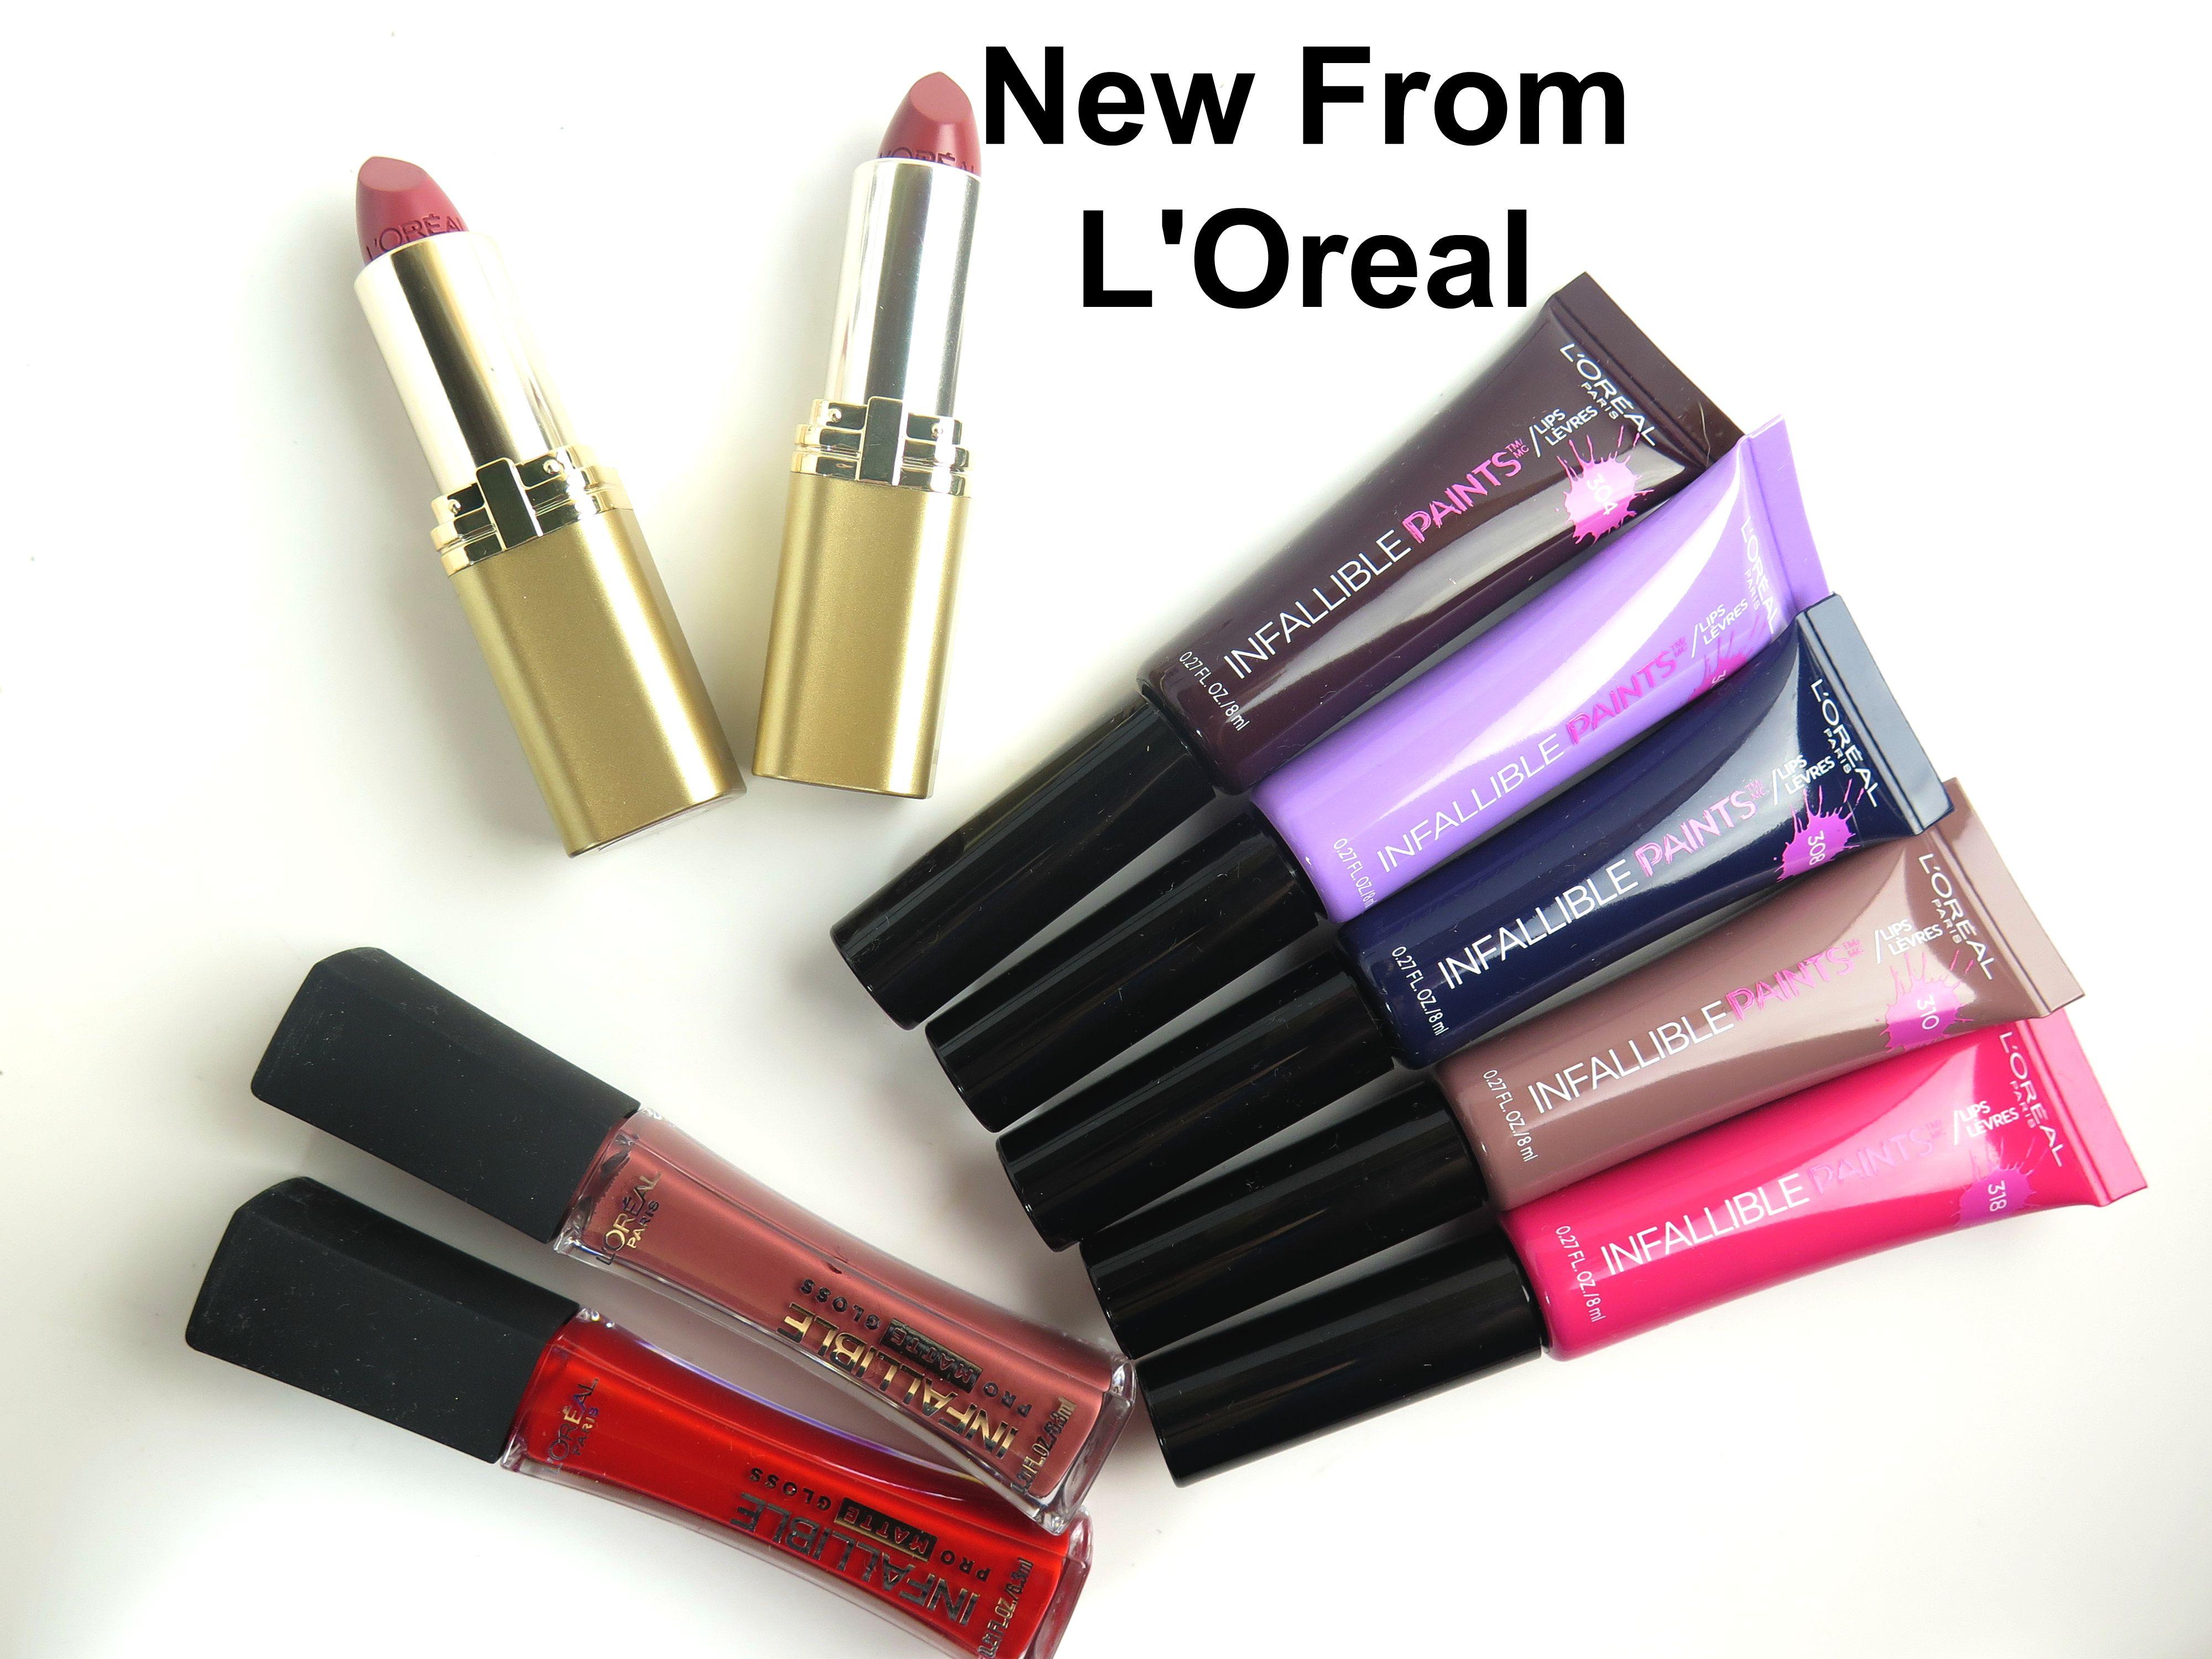 L'Oréal Paris Newest Lipsticks and Gloss Collections